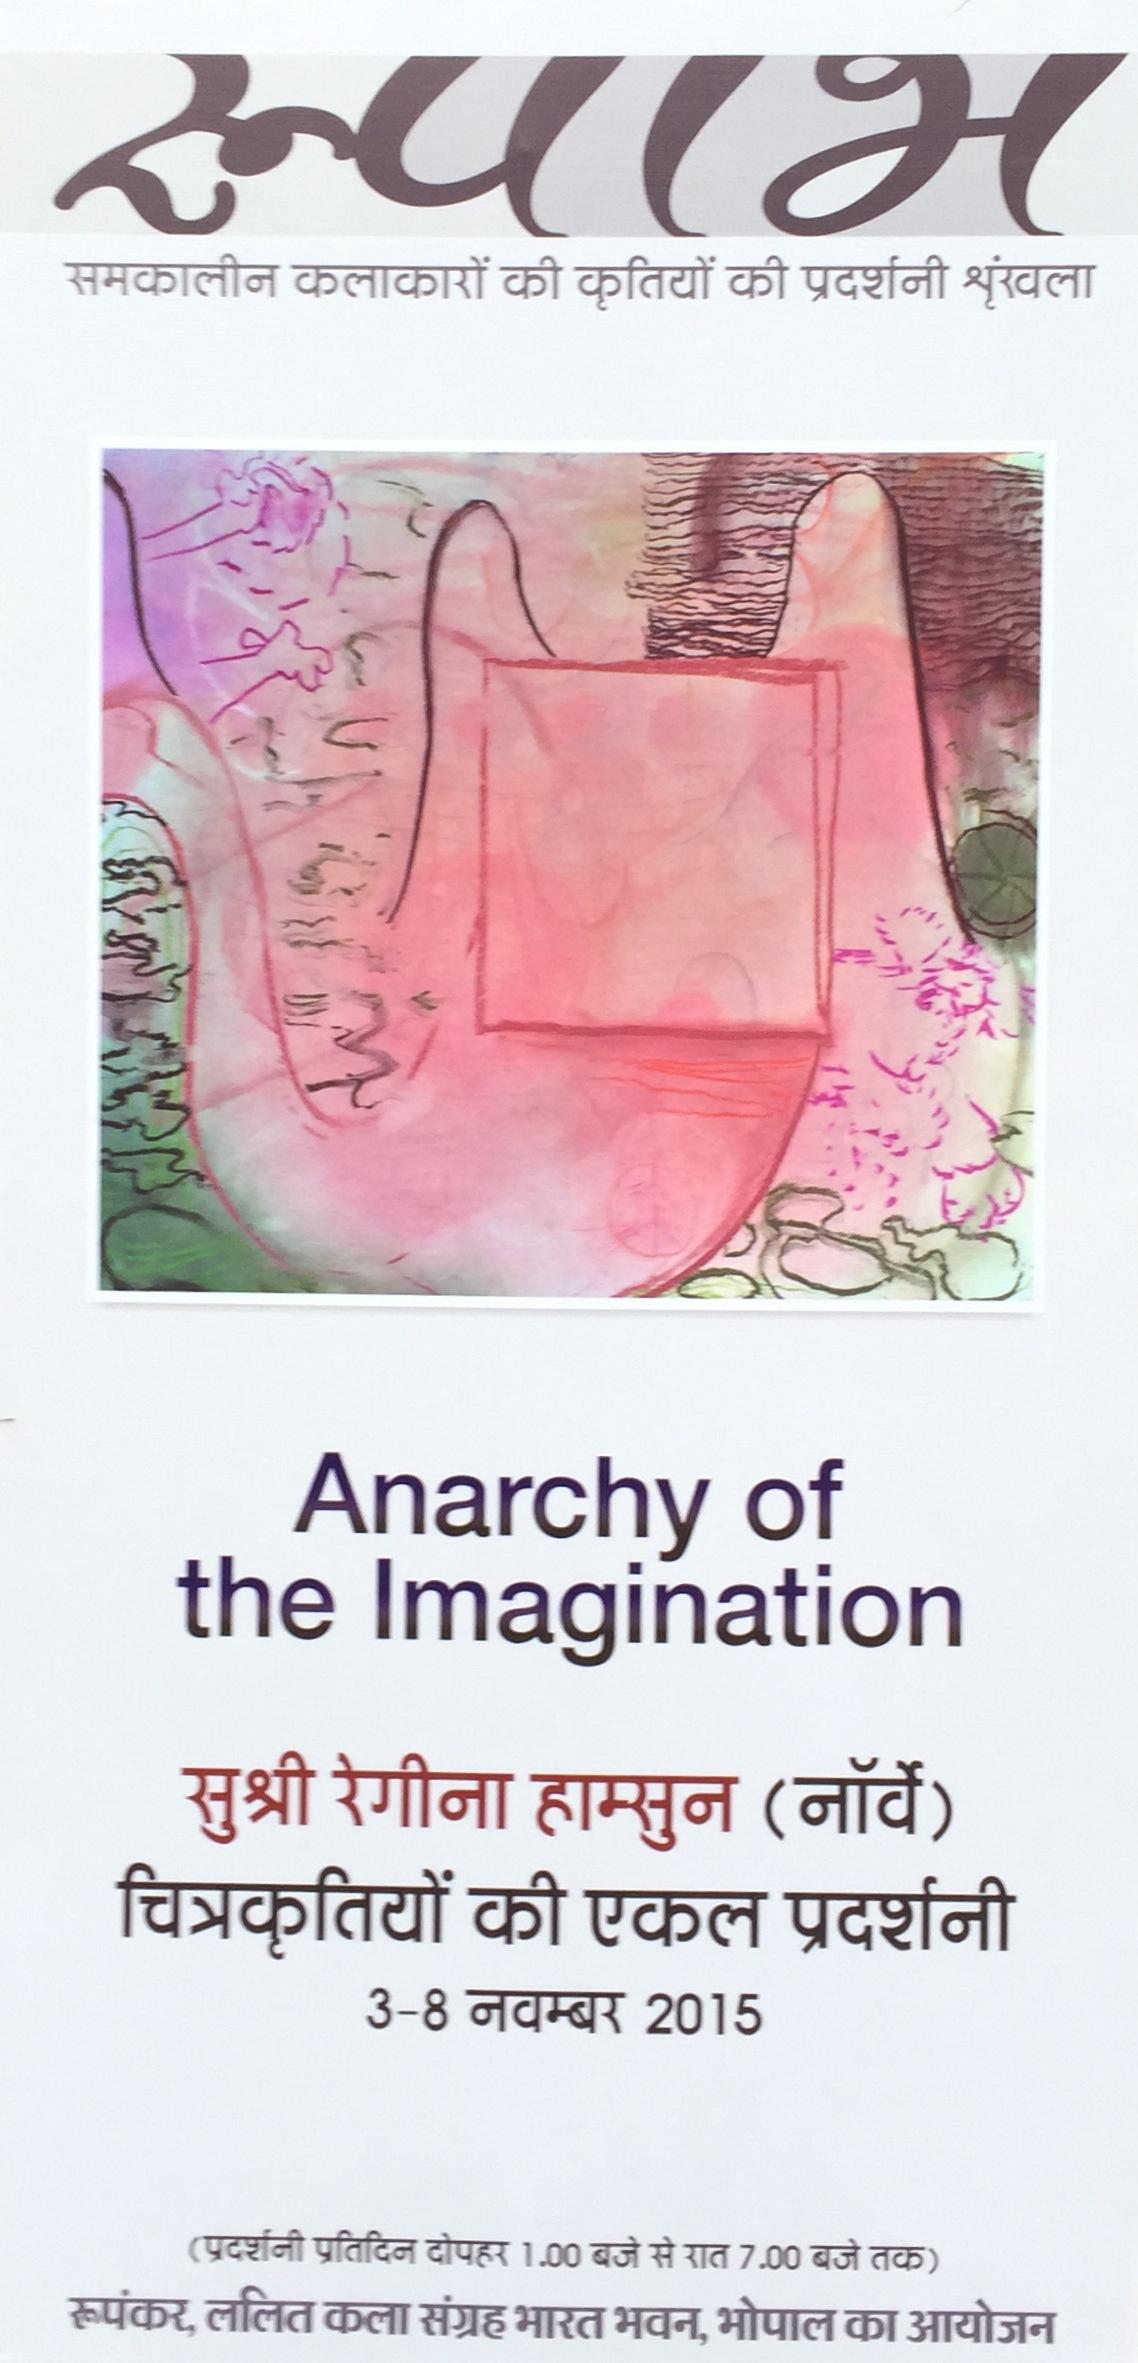 Anarchy poster.jpg